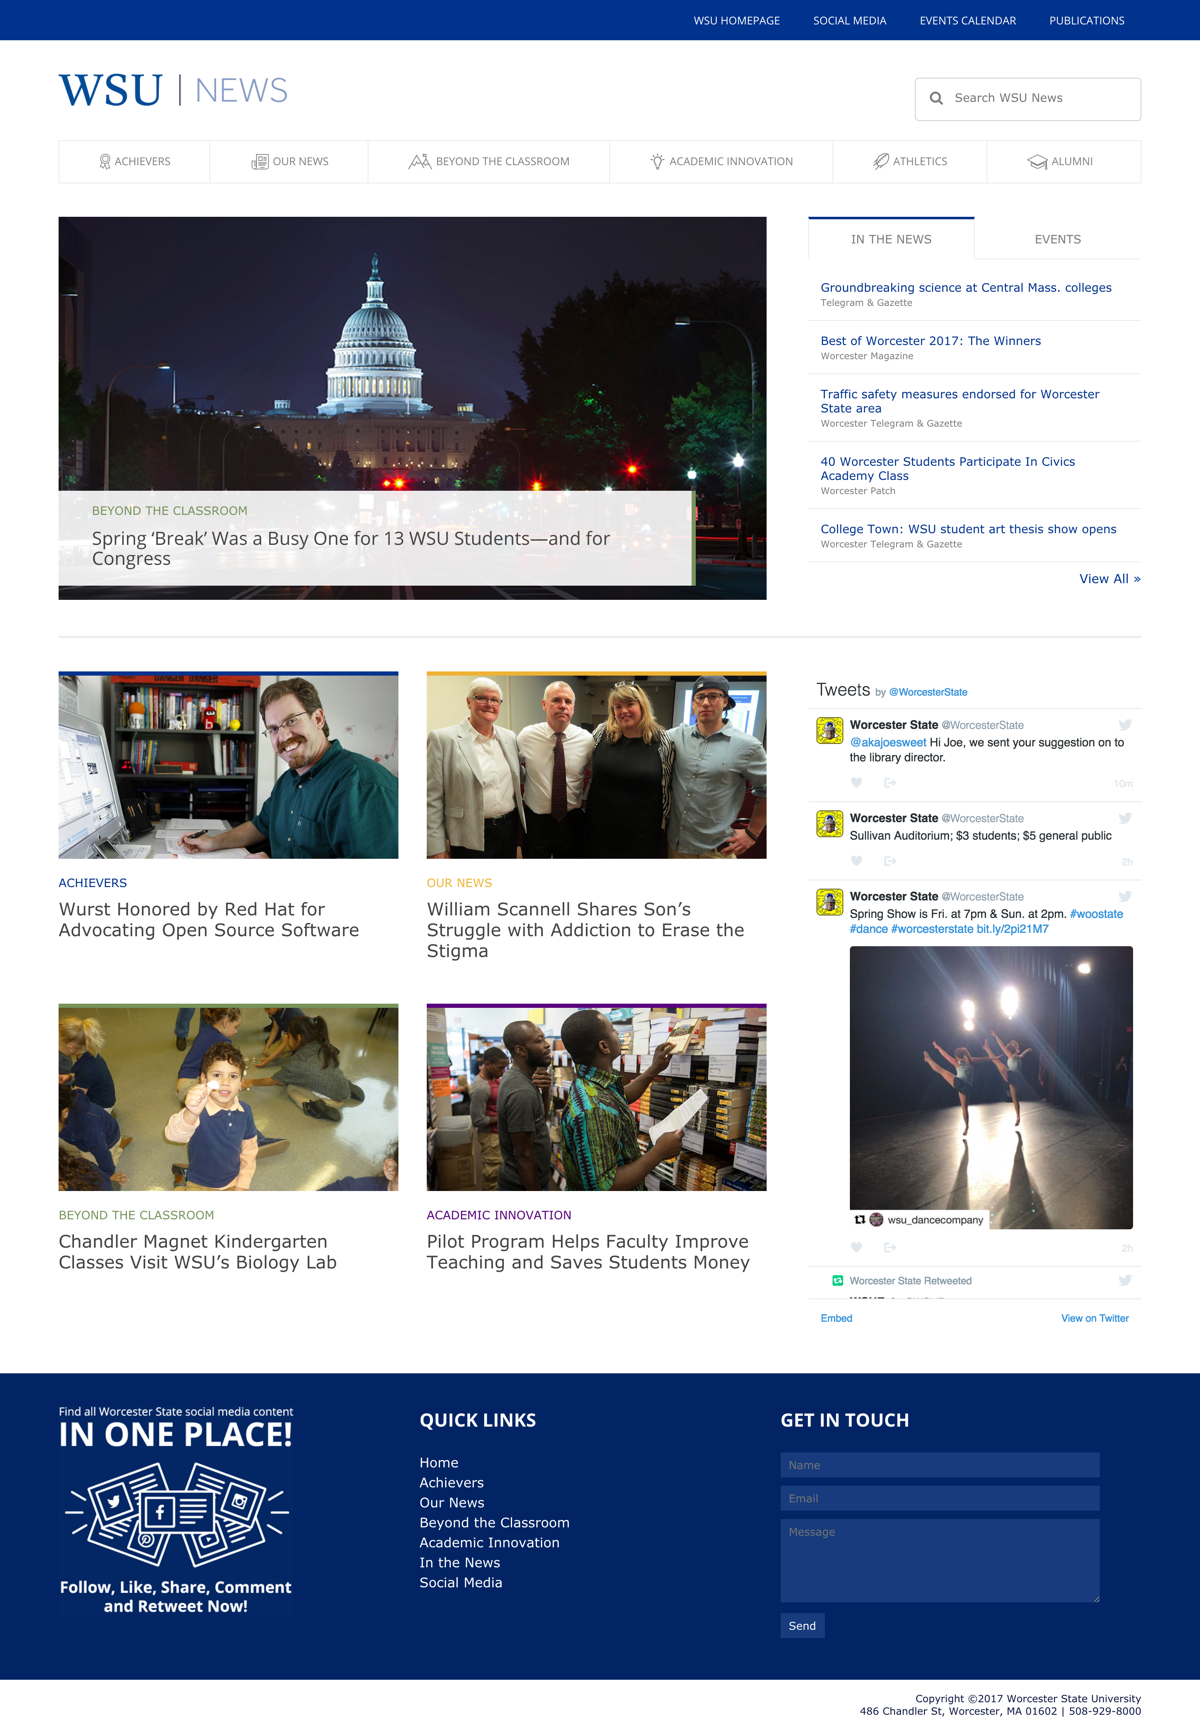 WSU News Full Landing Page